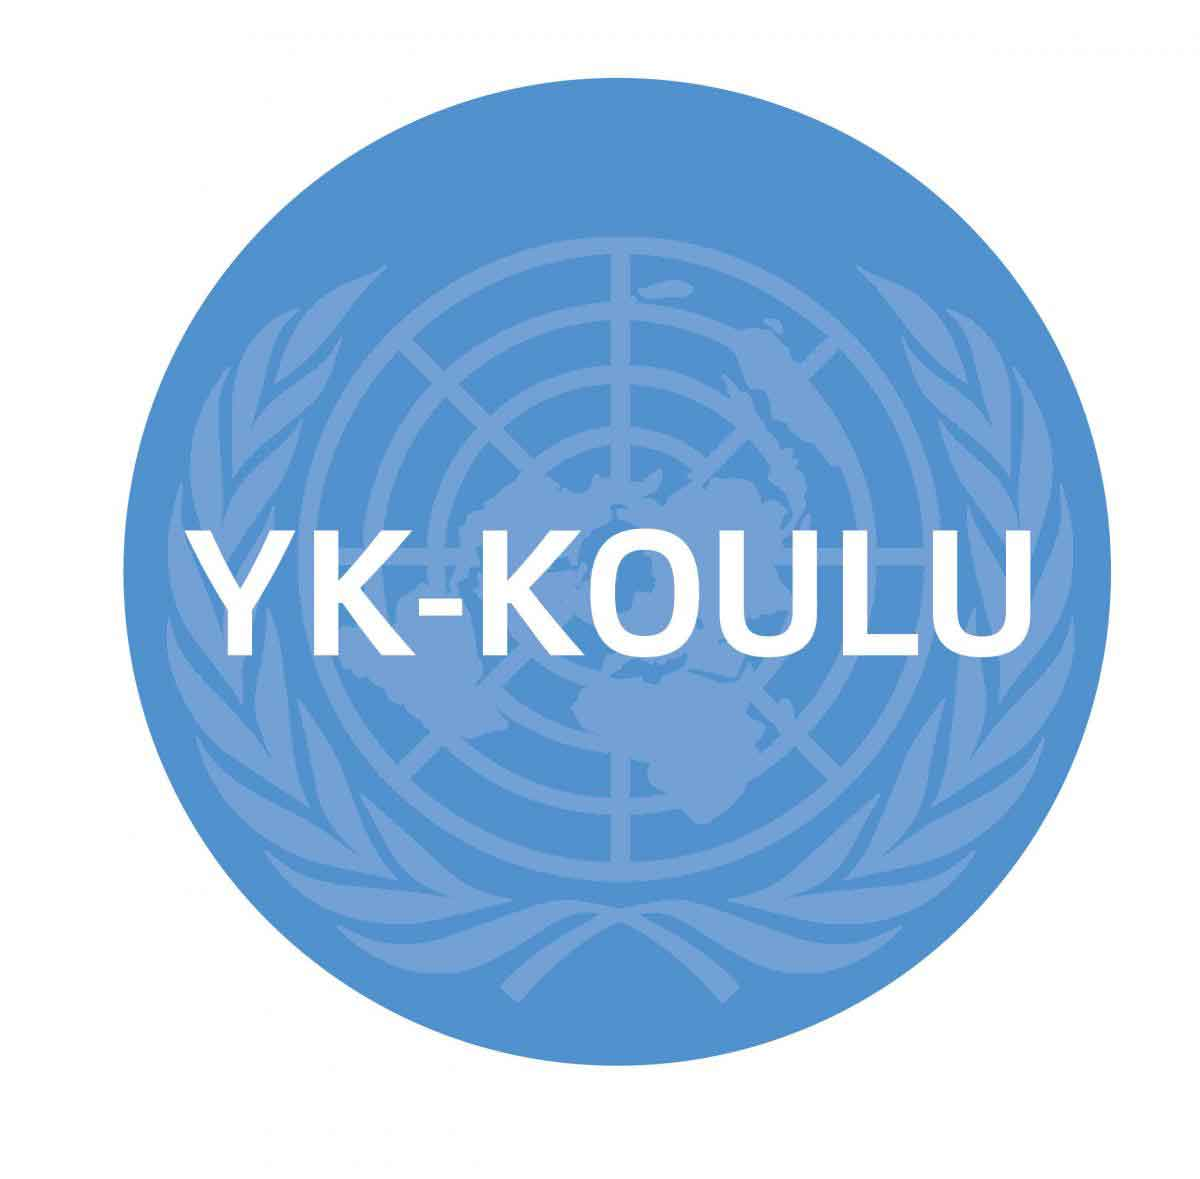 Perho Liiketalousopisto on YK-koulu